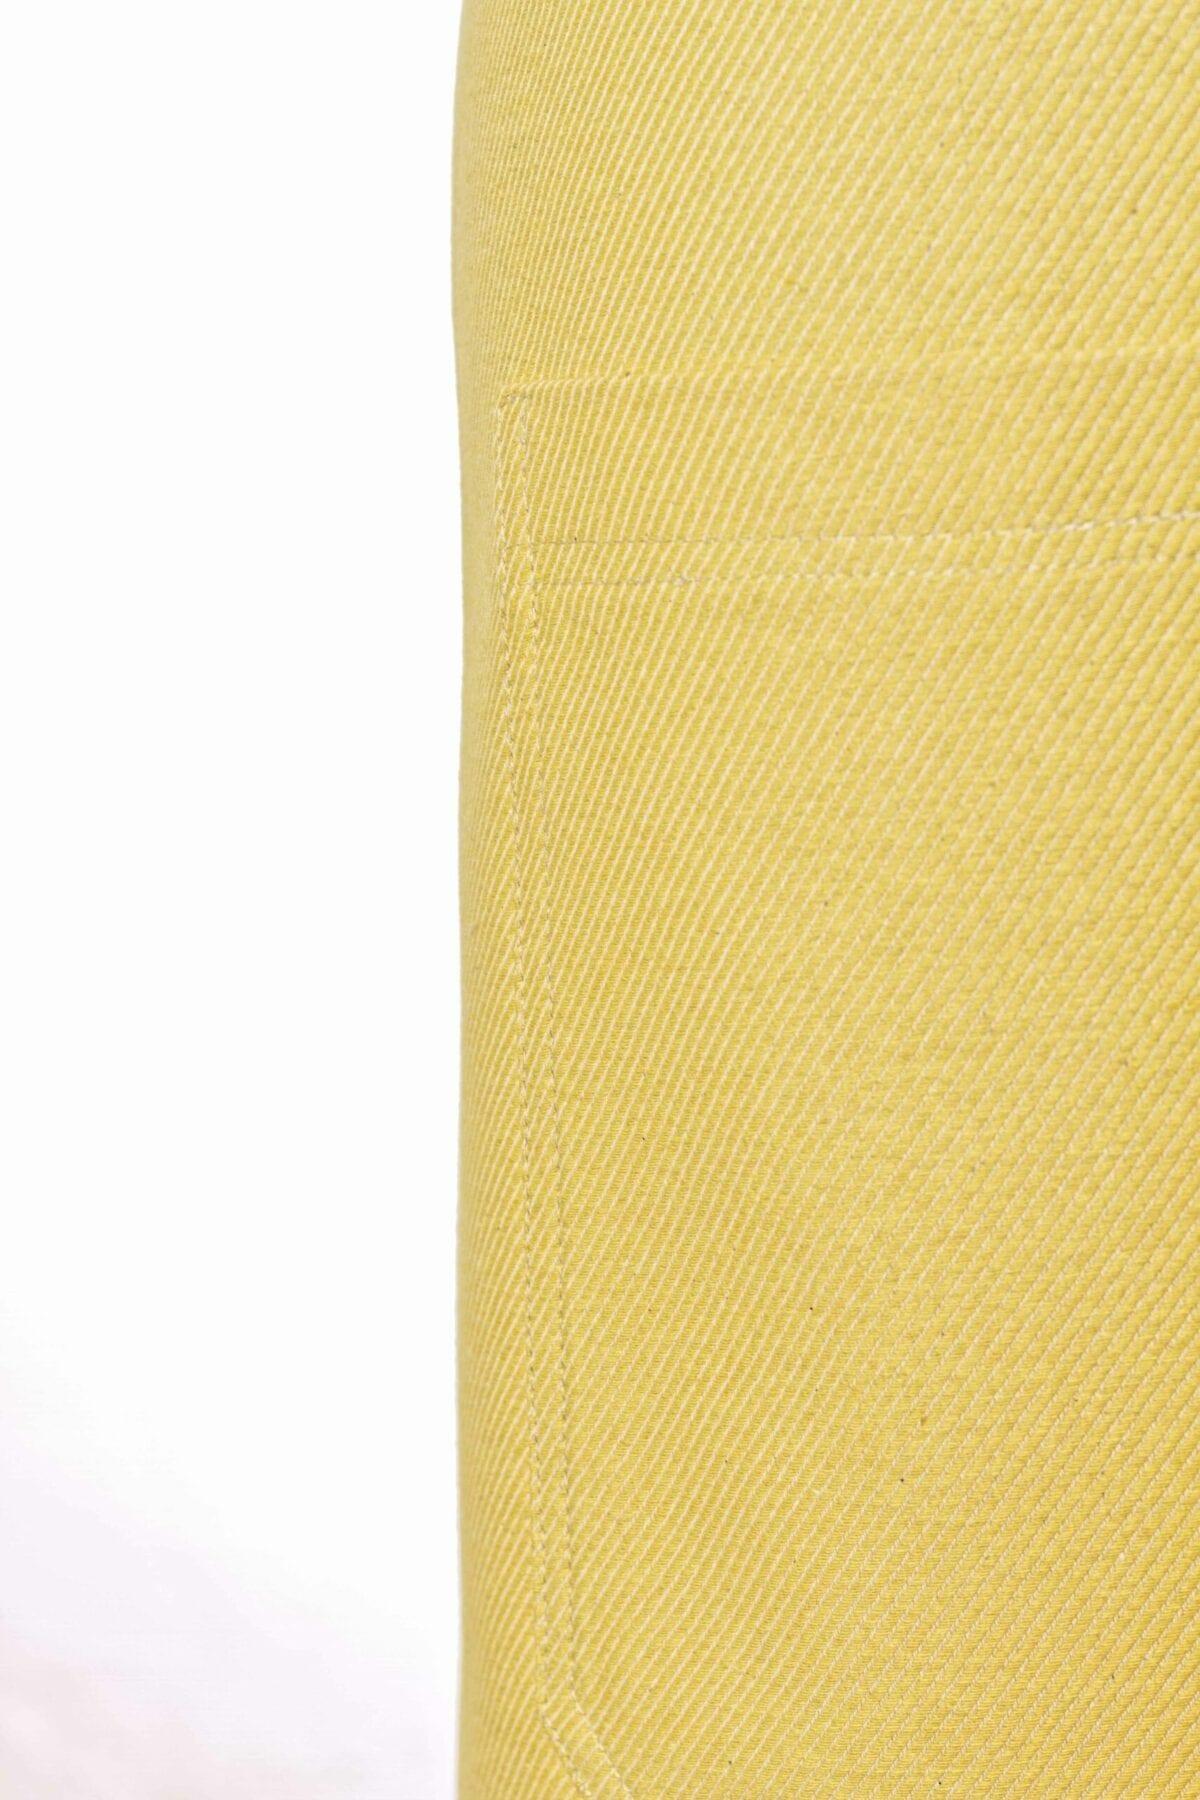 Zástera – Dobby yellow